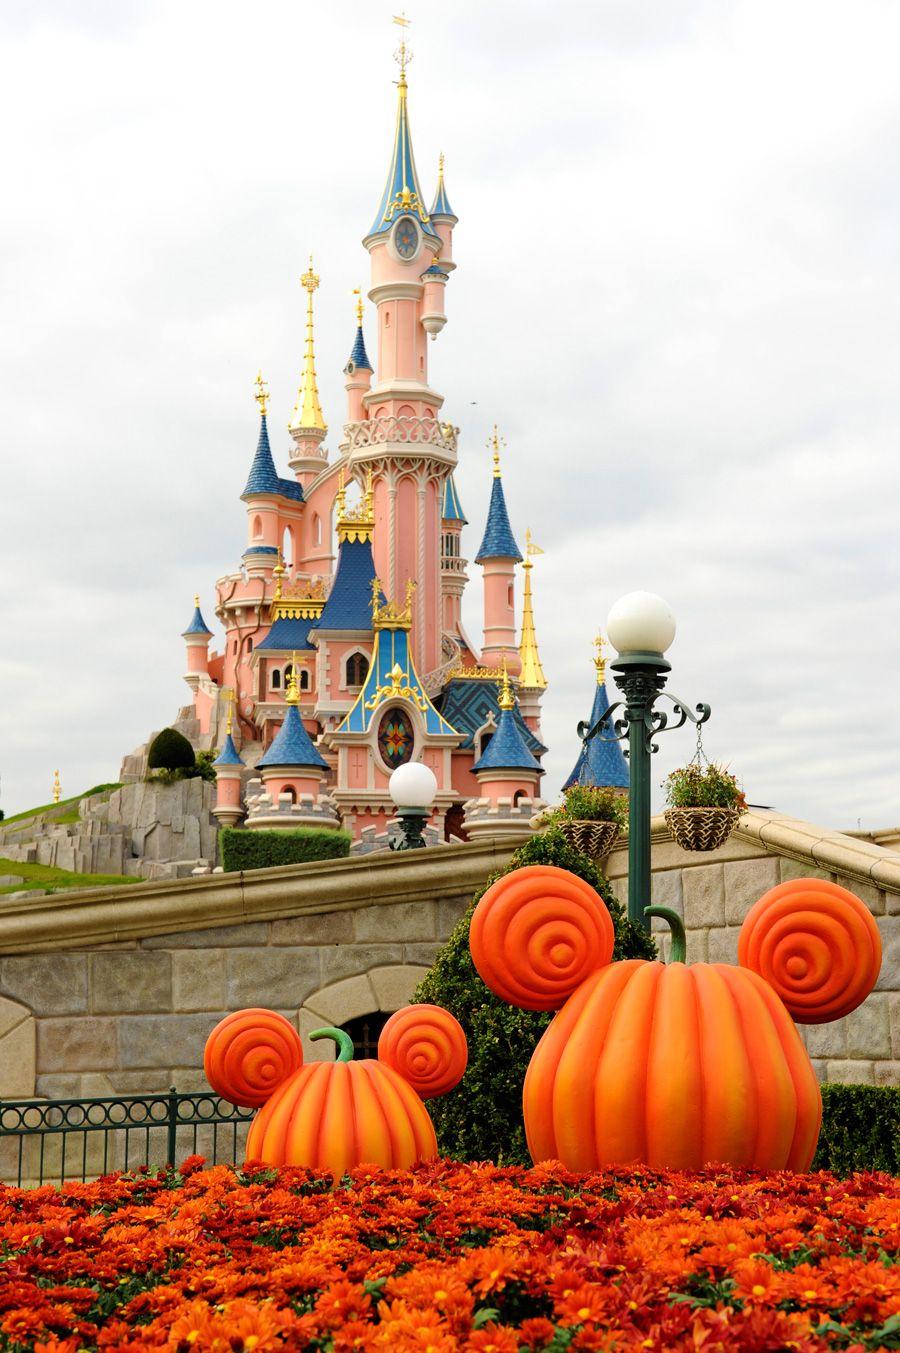 Disney's Halloween Festival in Paris Disneyland